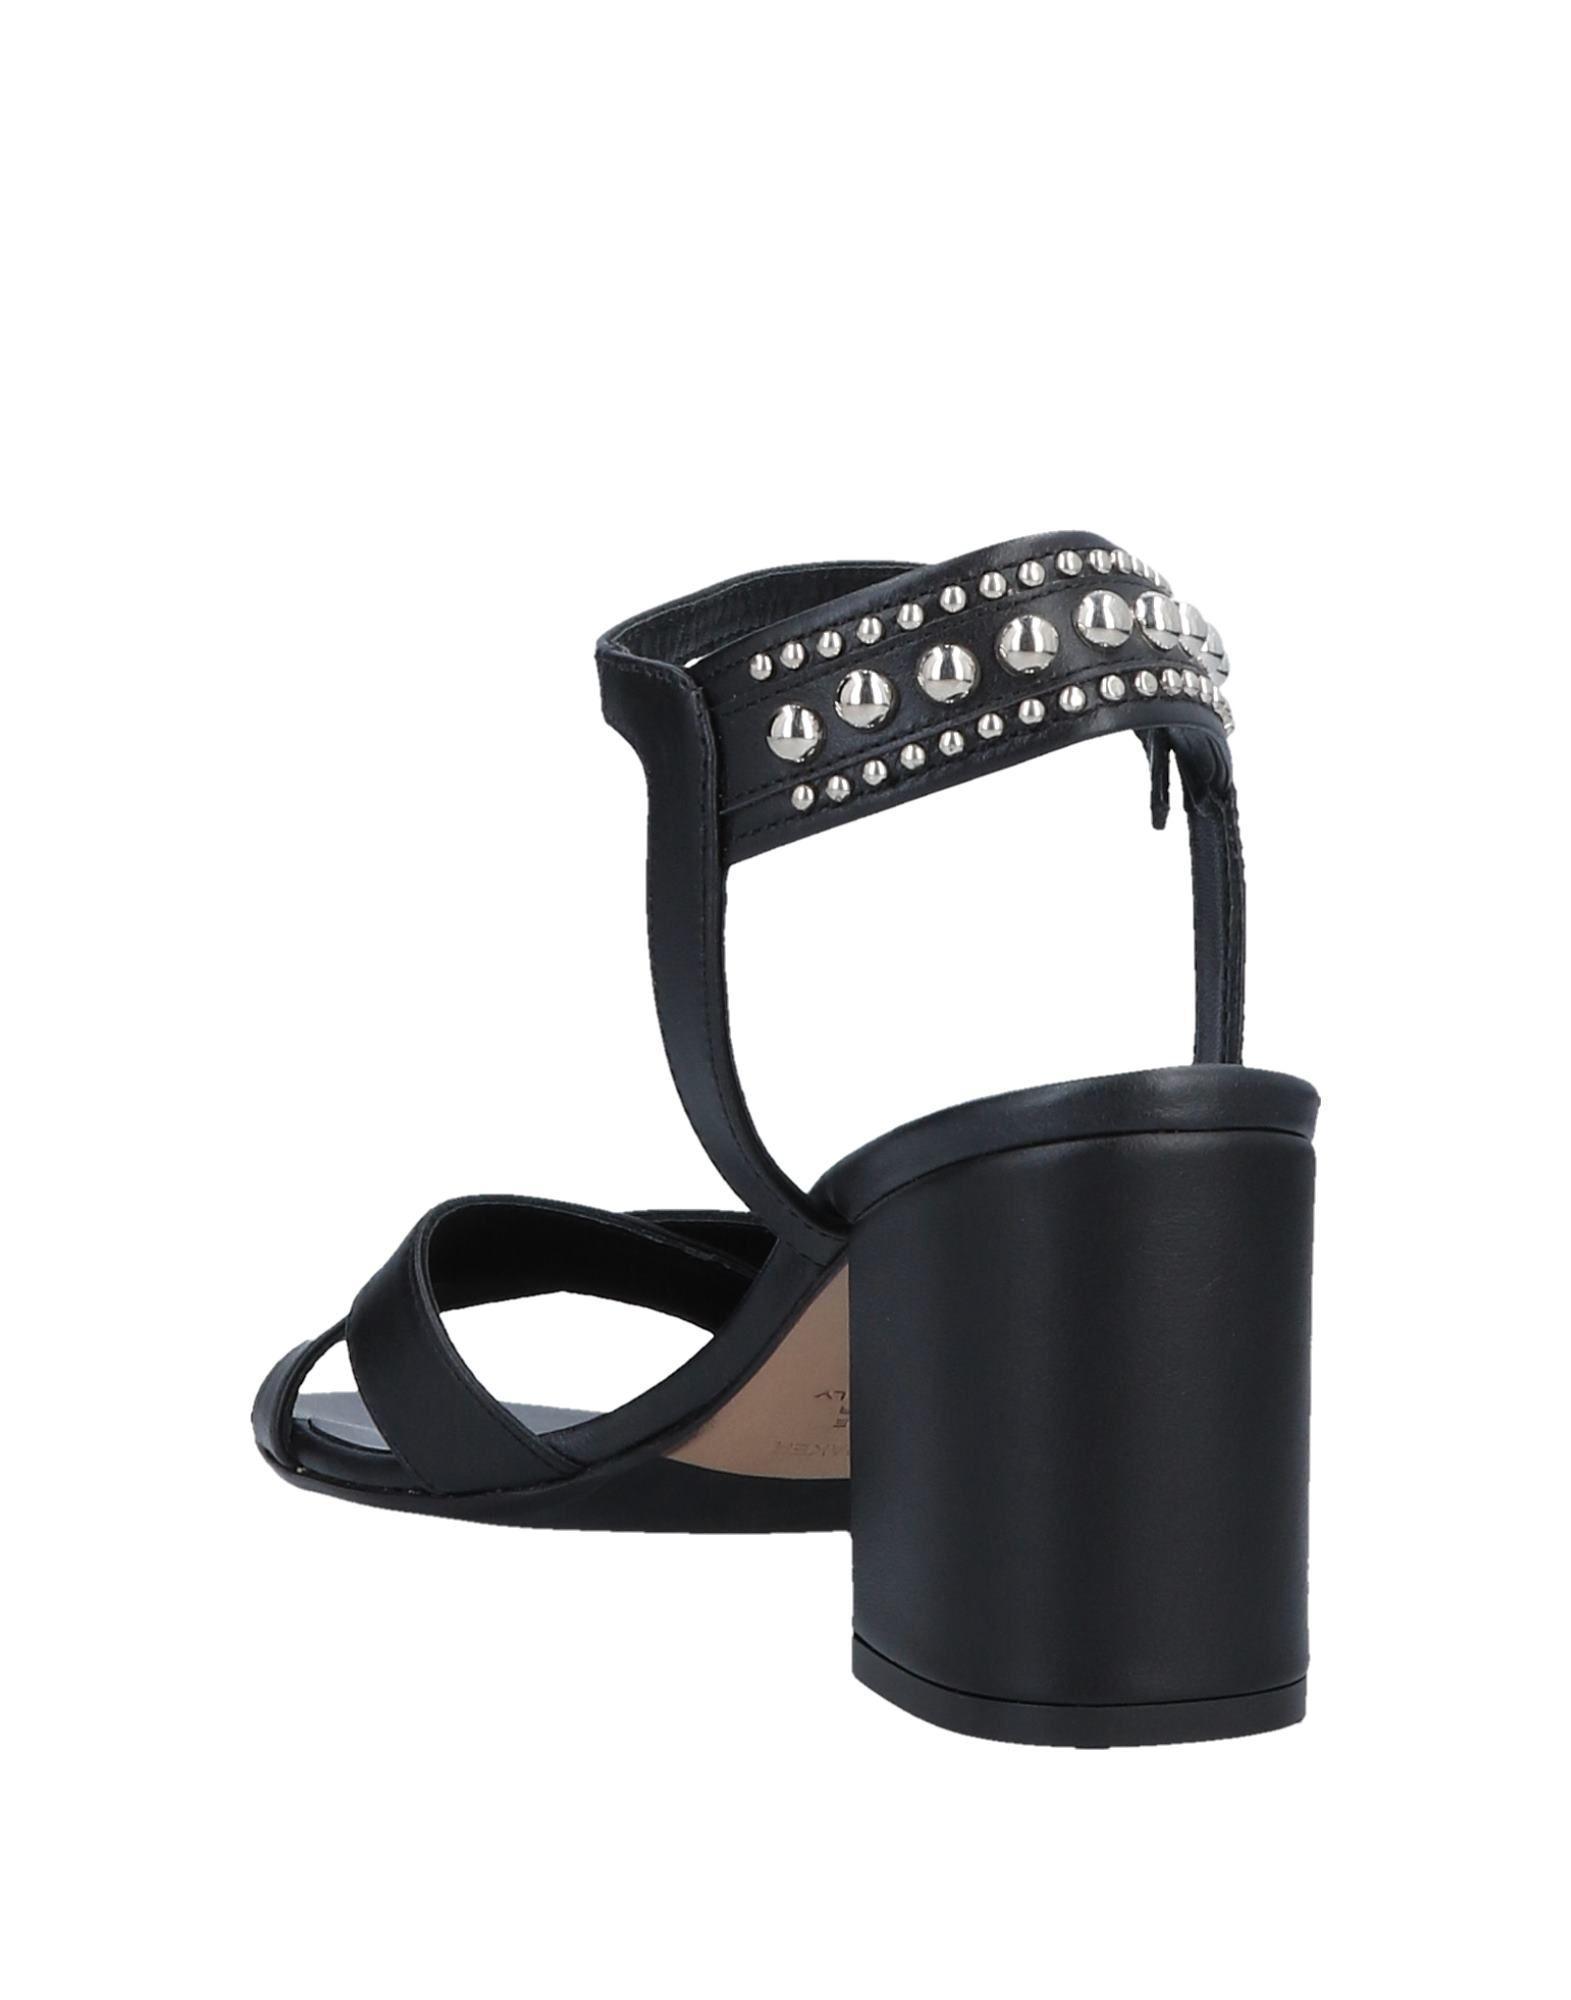 328ef89fc1de8 Norma J. Baker Sandals in Black - Lyst